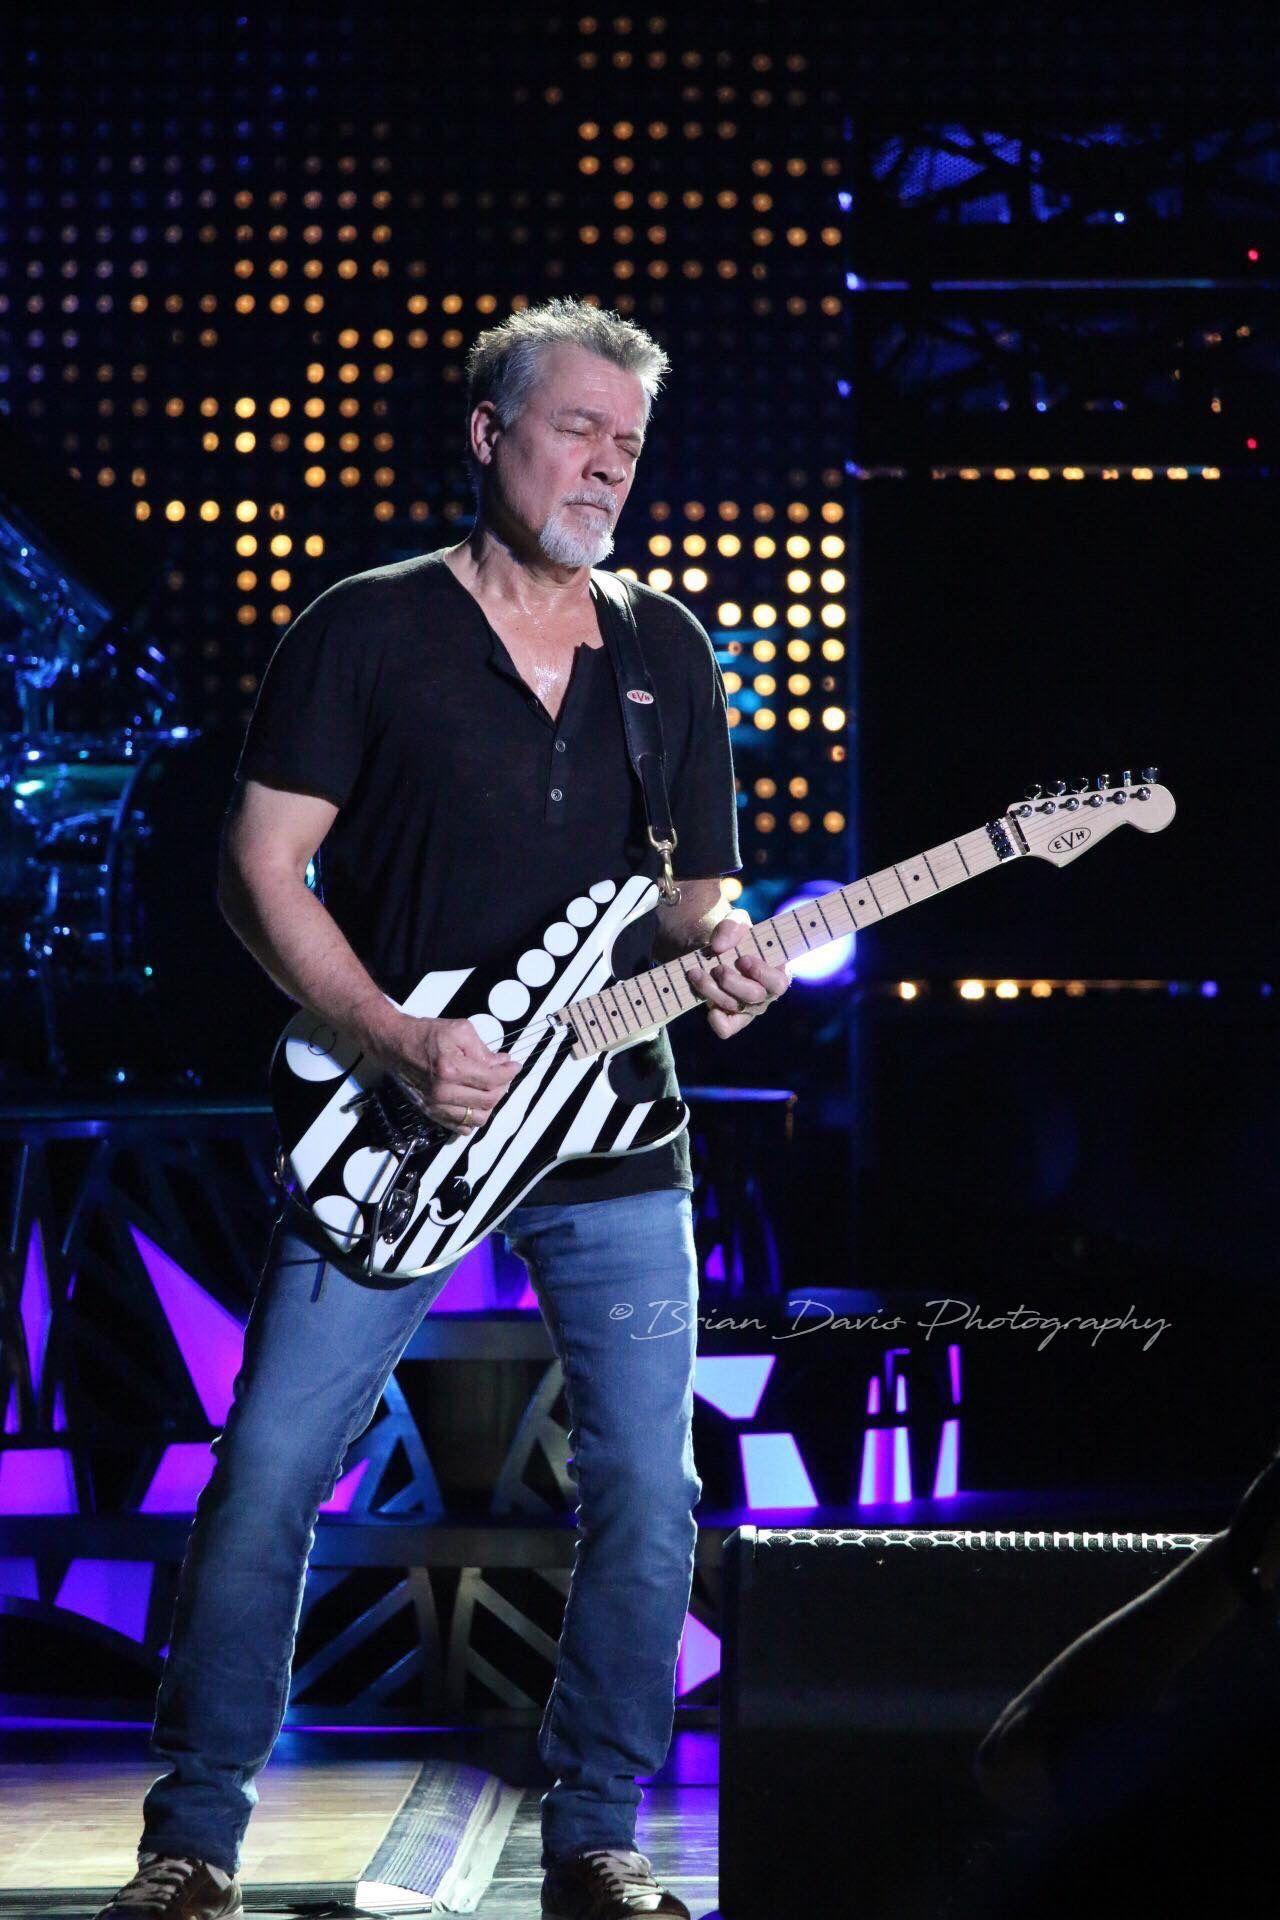 Pin By Frank Schiminesky On Eddie Van Halen In 2020 Eddie Van Halen Van Halen Van Halen 5150